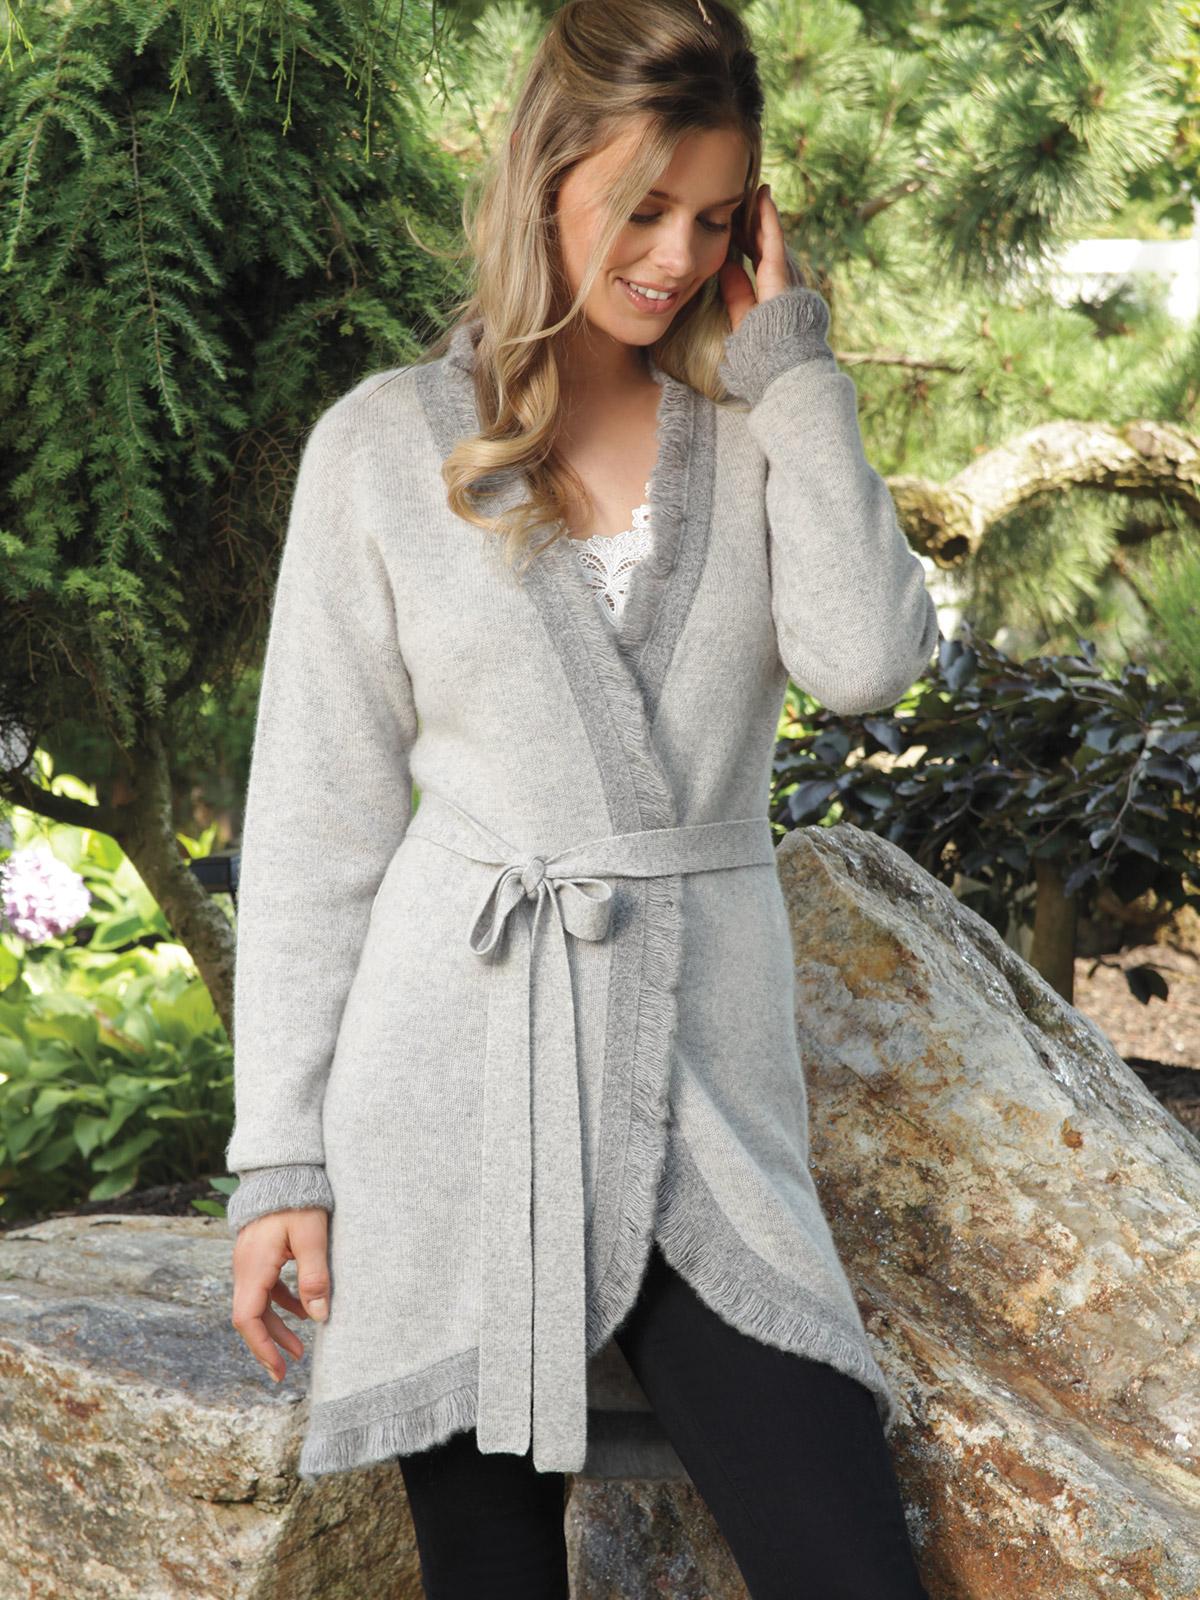 Mandy-Sweater-Gray_3444.jpg